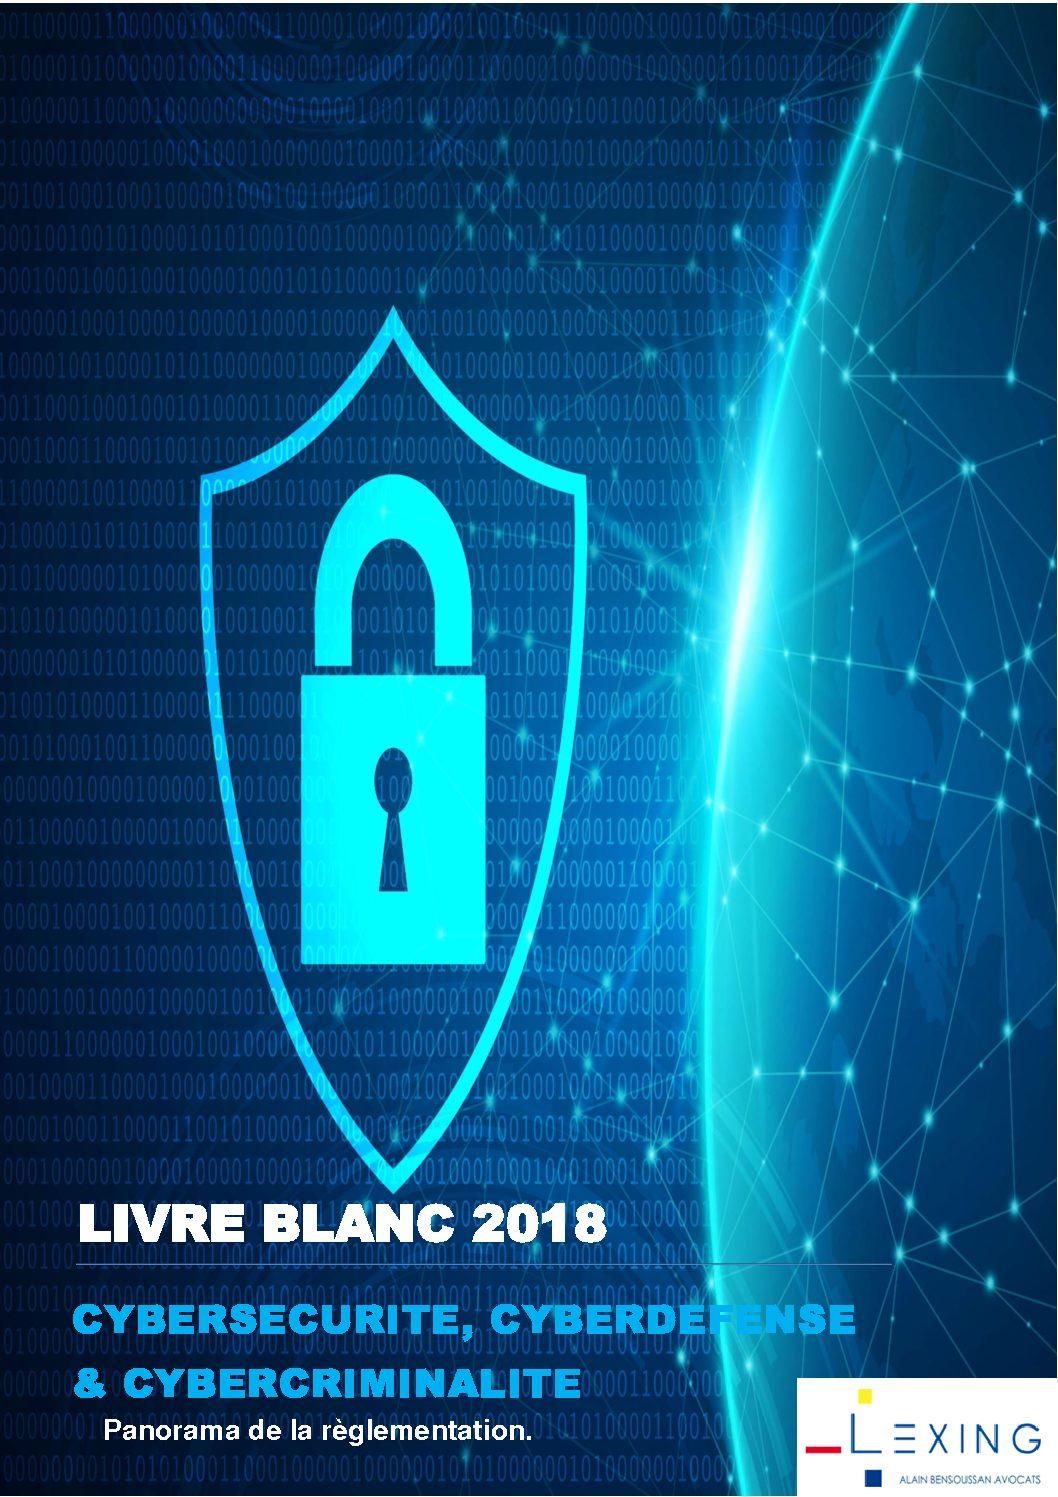 Livre blanc cybersécurité, cyberdéfense & cybercriminalité